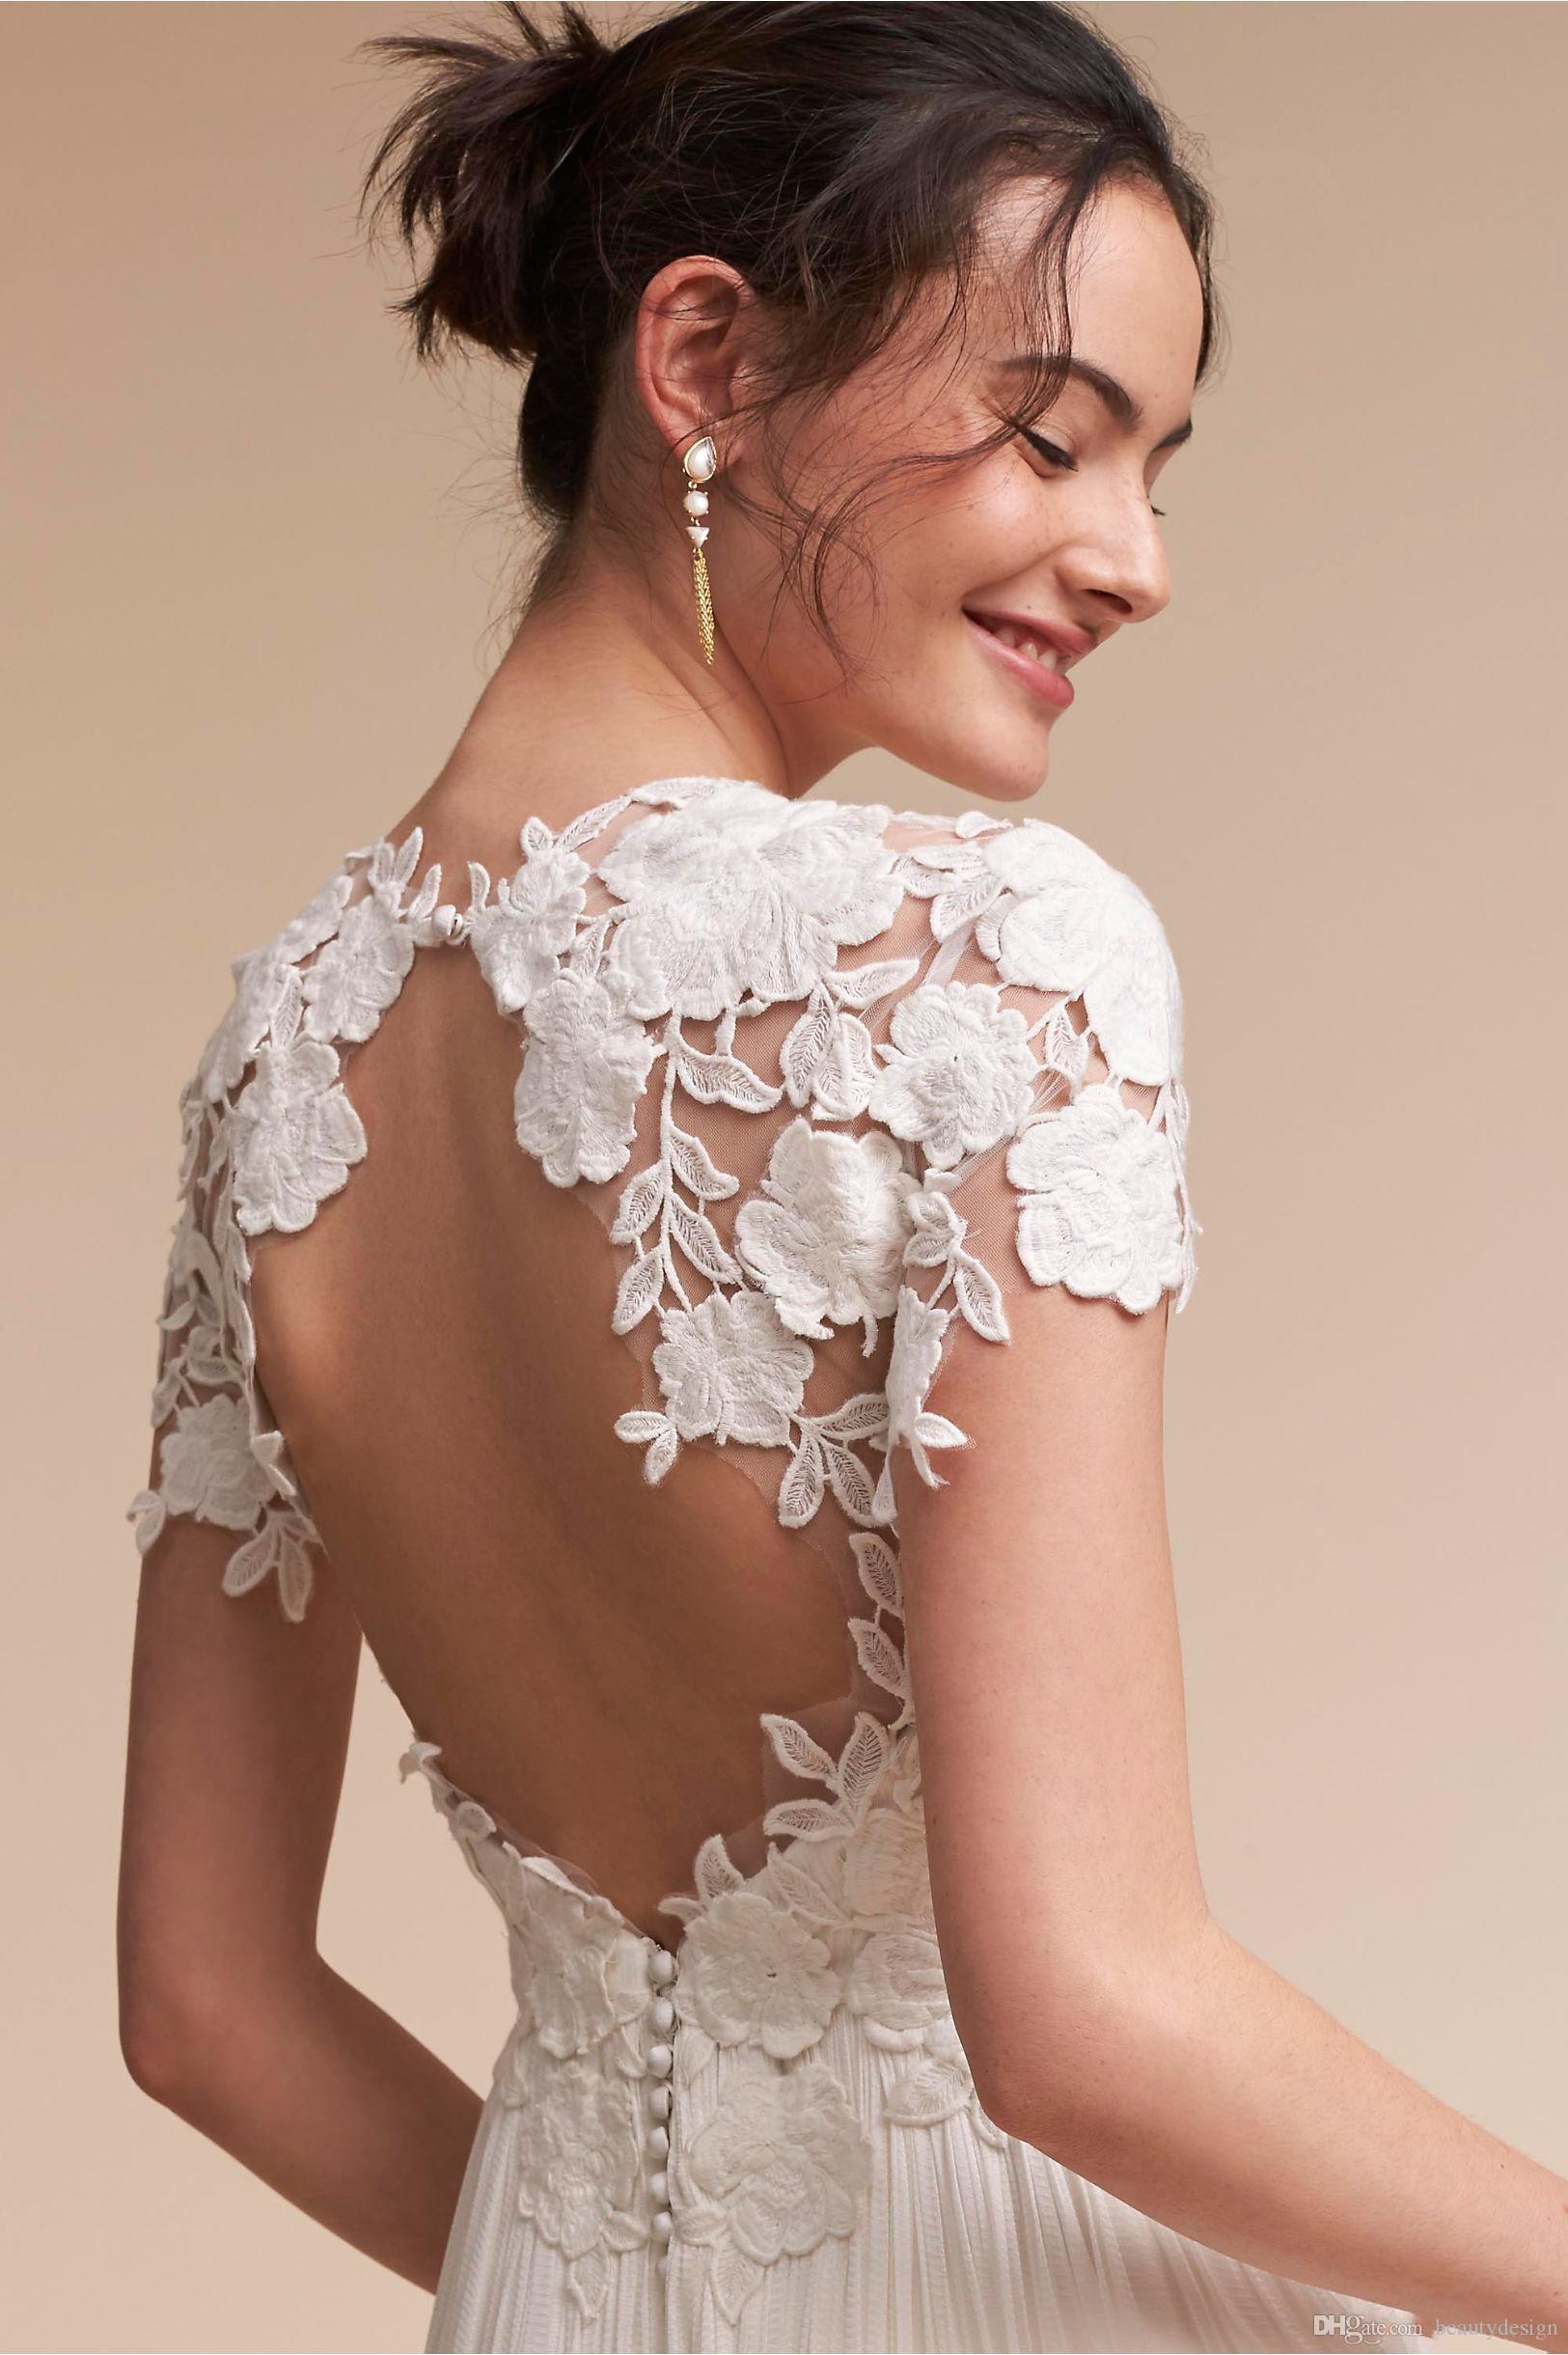 2017 Simple Design Lace Cap Sleeves Wedding Dresses Empire Waist A Line Summer Beach Boho Bridal Gowns Floor Length Key Hole Backless